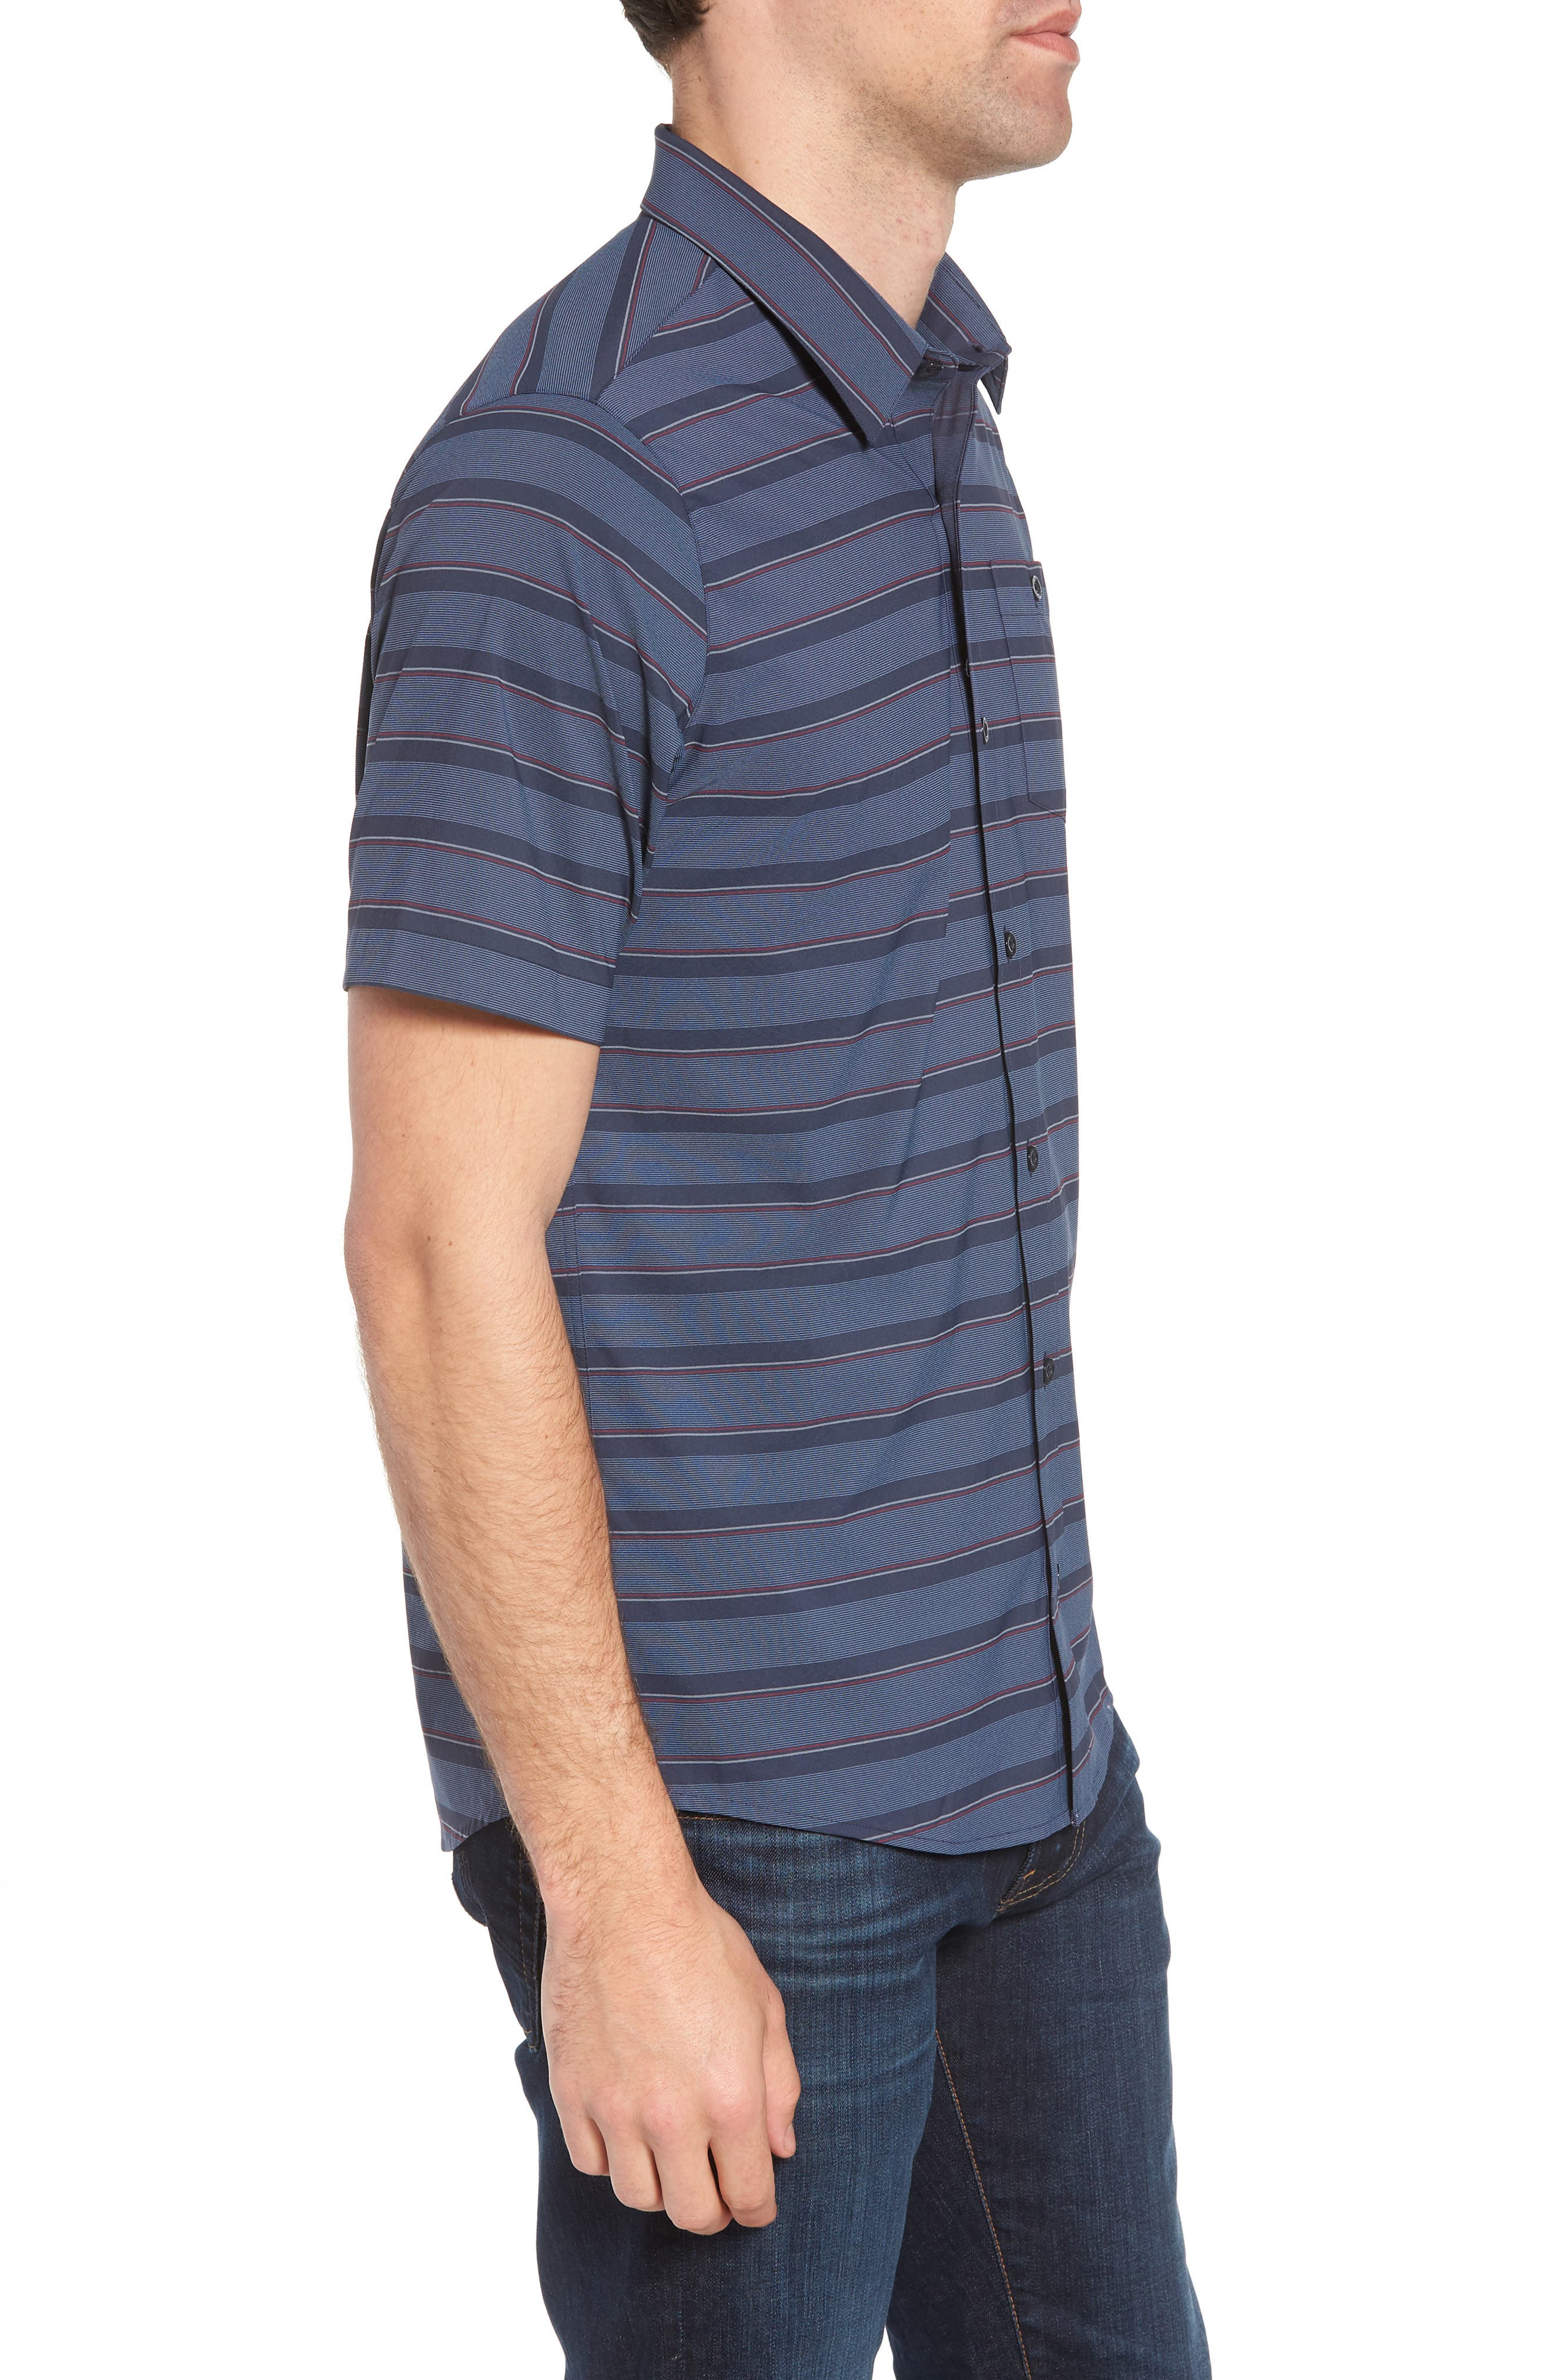 Quiver Regular Fit Sport Shirt,                             Alternate thumbnail 3, color,                             400